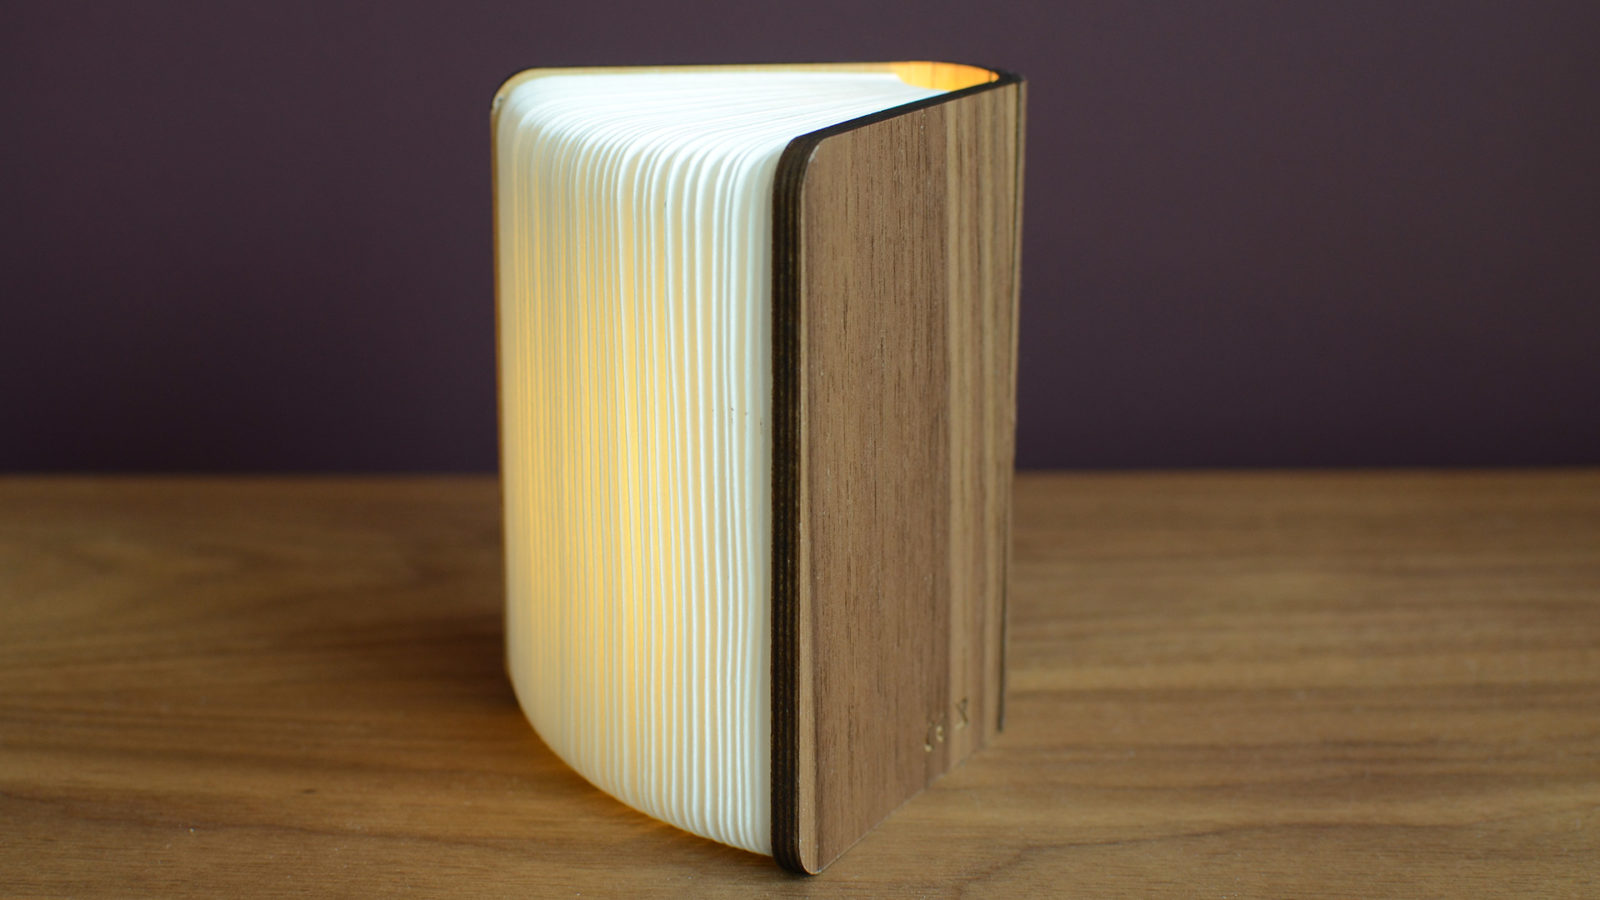 warm-book-light-in-walnut